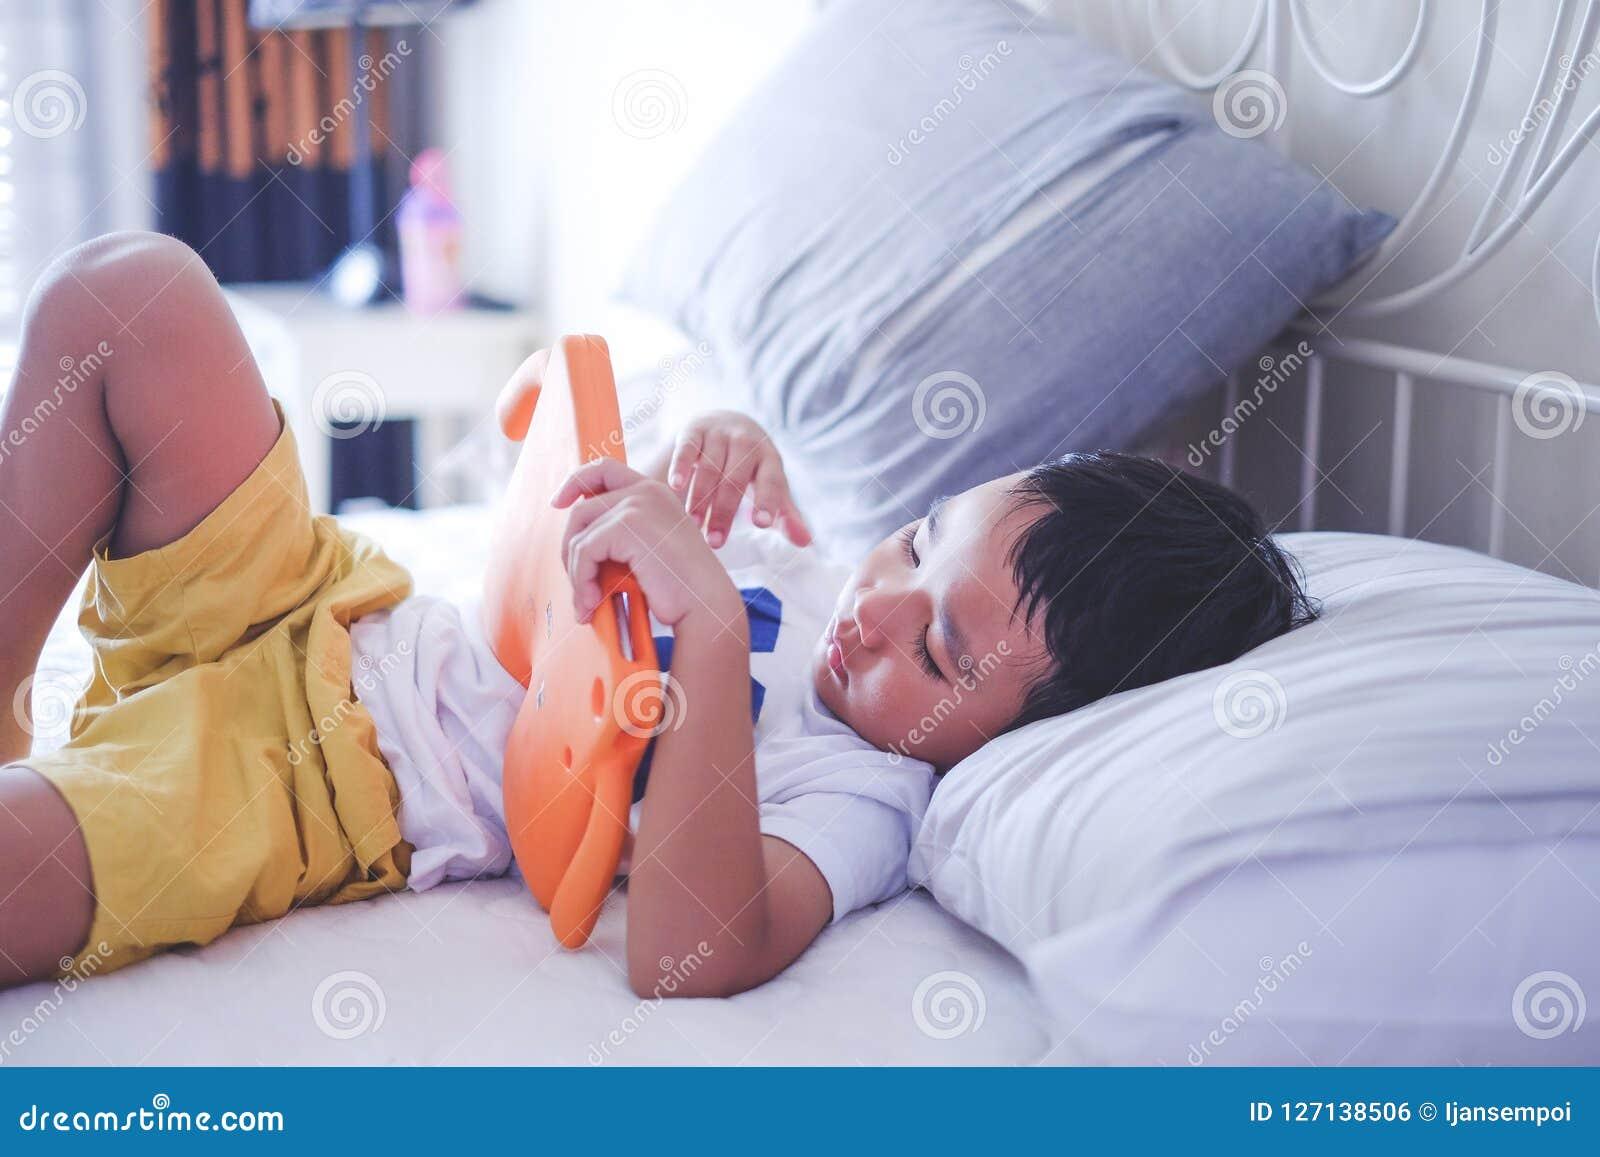 Азиатский мальчик наблюдая онлайн видео на кровати